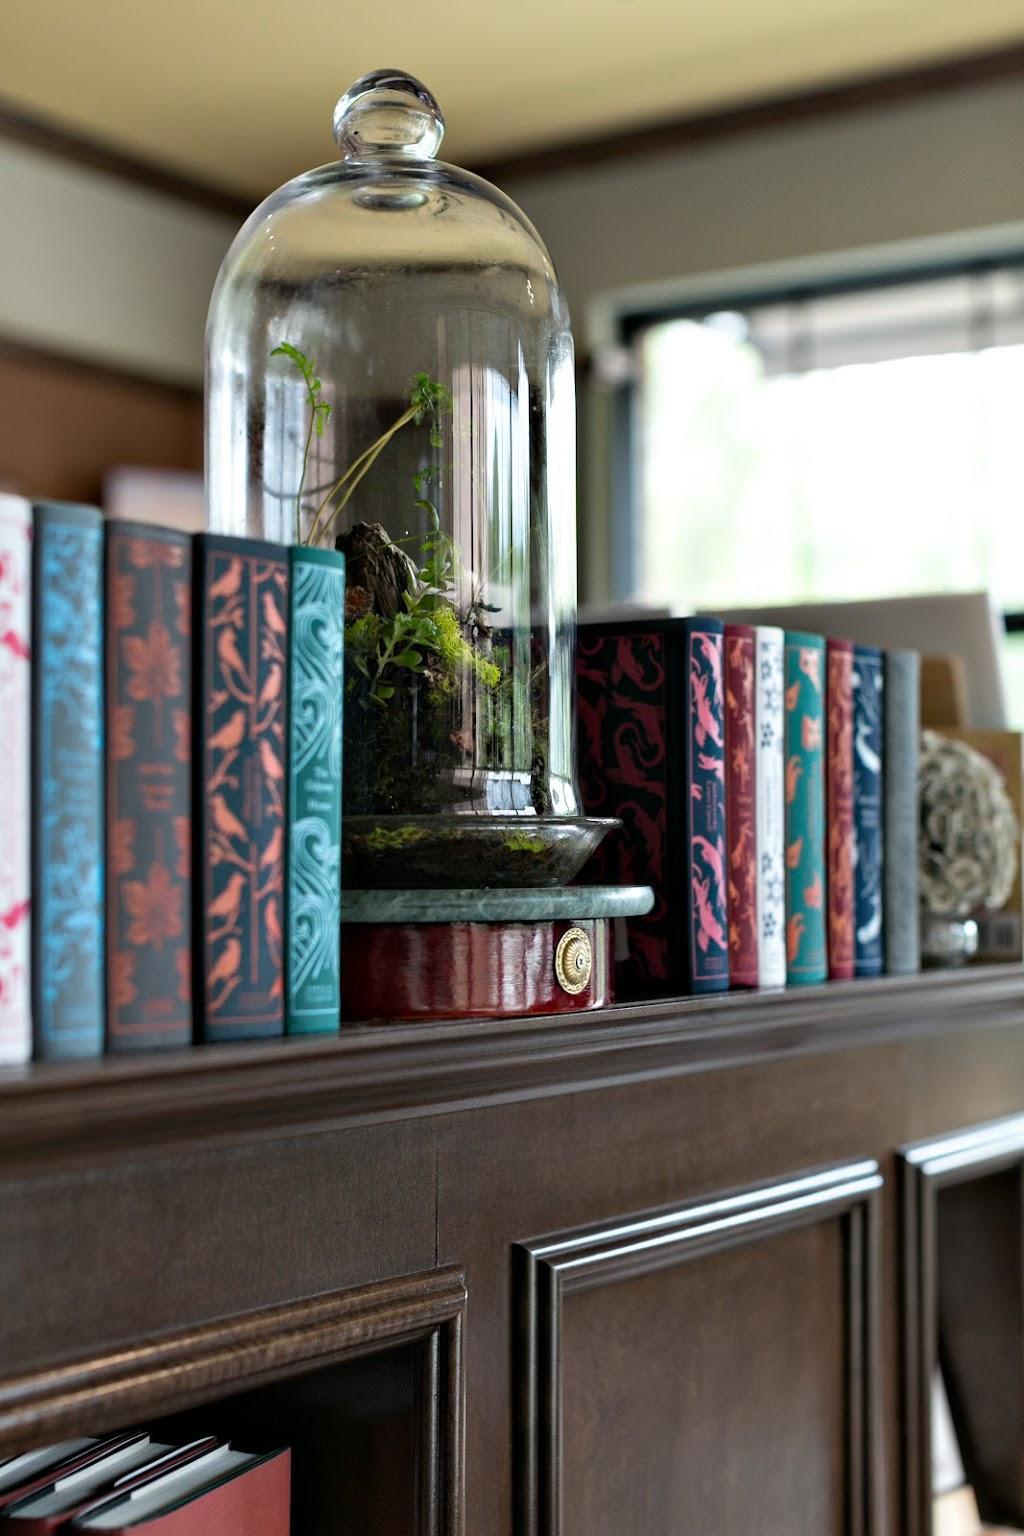 Hills & Hamlets Bookshop - book store  | Photo 3 of 10 | Address: 10625 Serenbe Ln B, Chattahoochee Hills, GA 30268, USA | Phone: (470) 488-0330